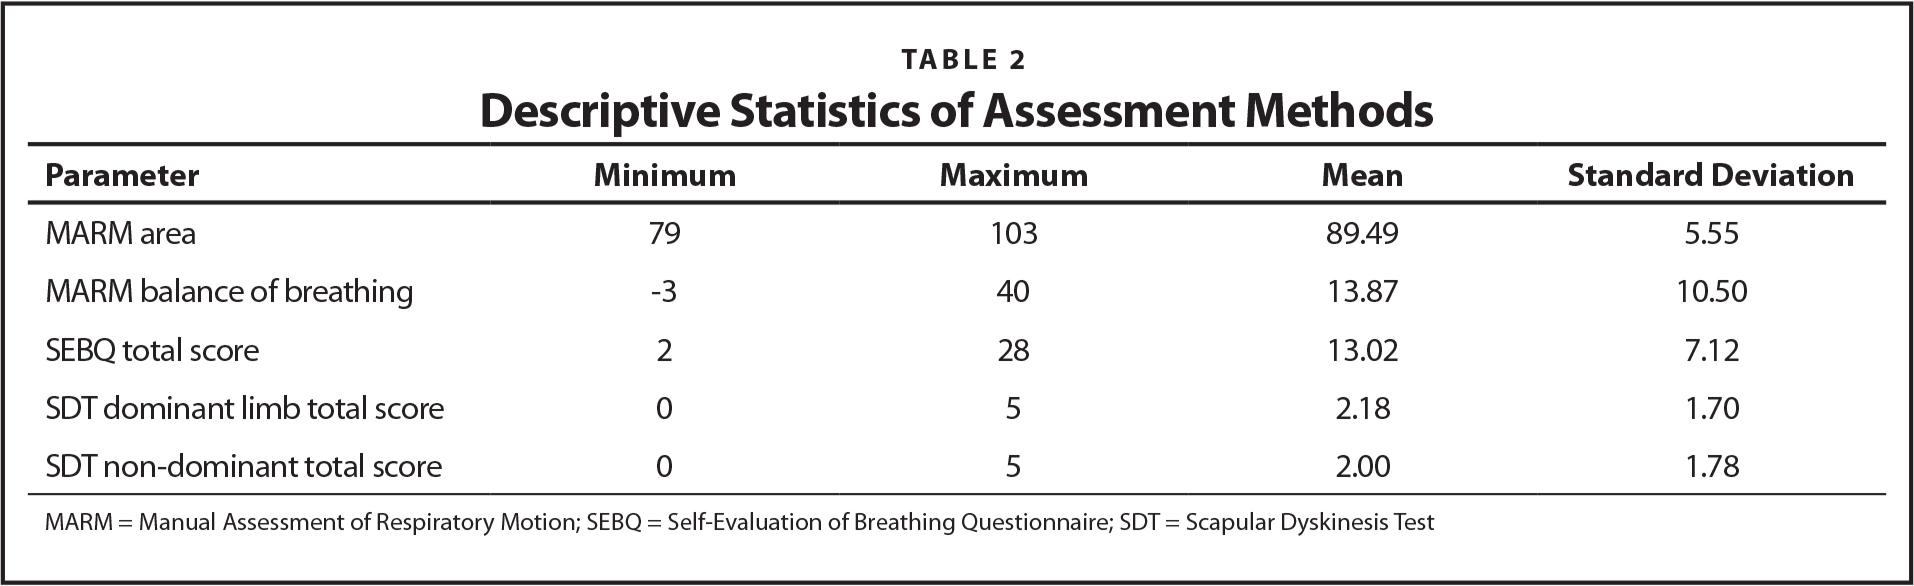 Descriptive Statistics of Assessment Methods